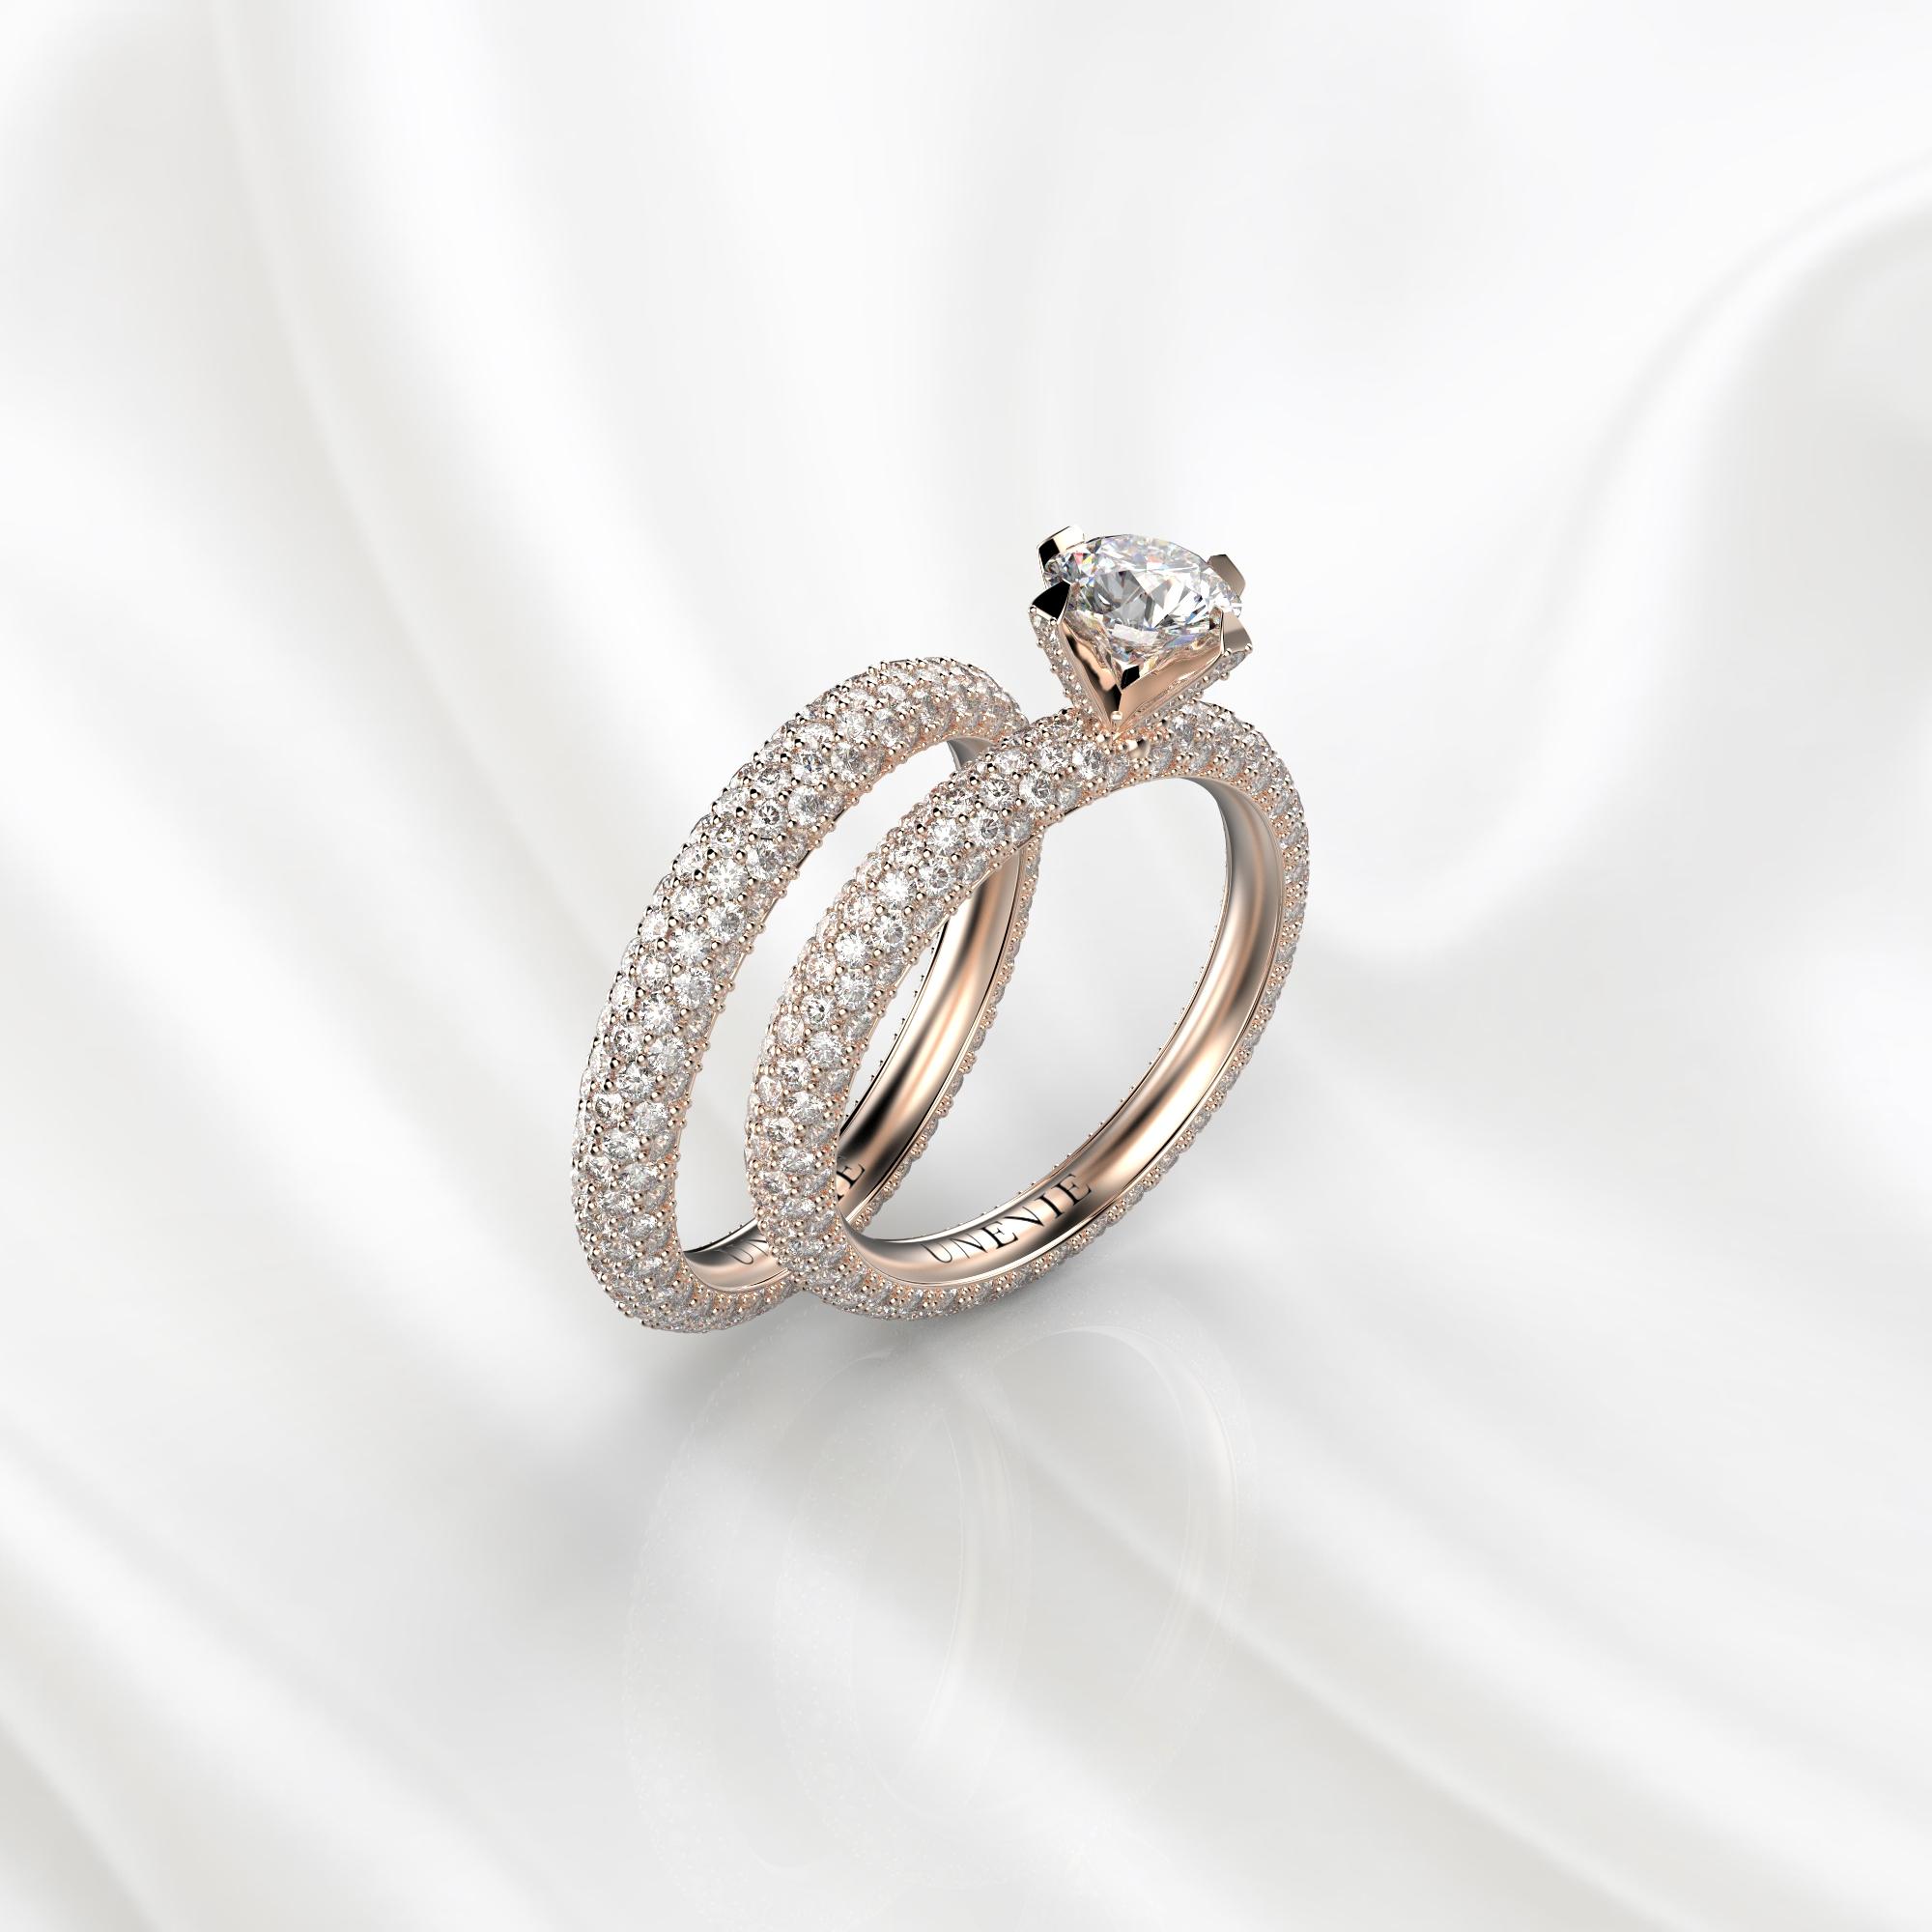 N26 Сет колец для помолвки из розового золота с бриллиантами